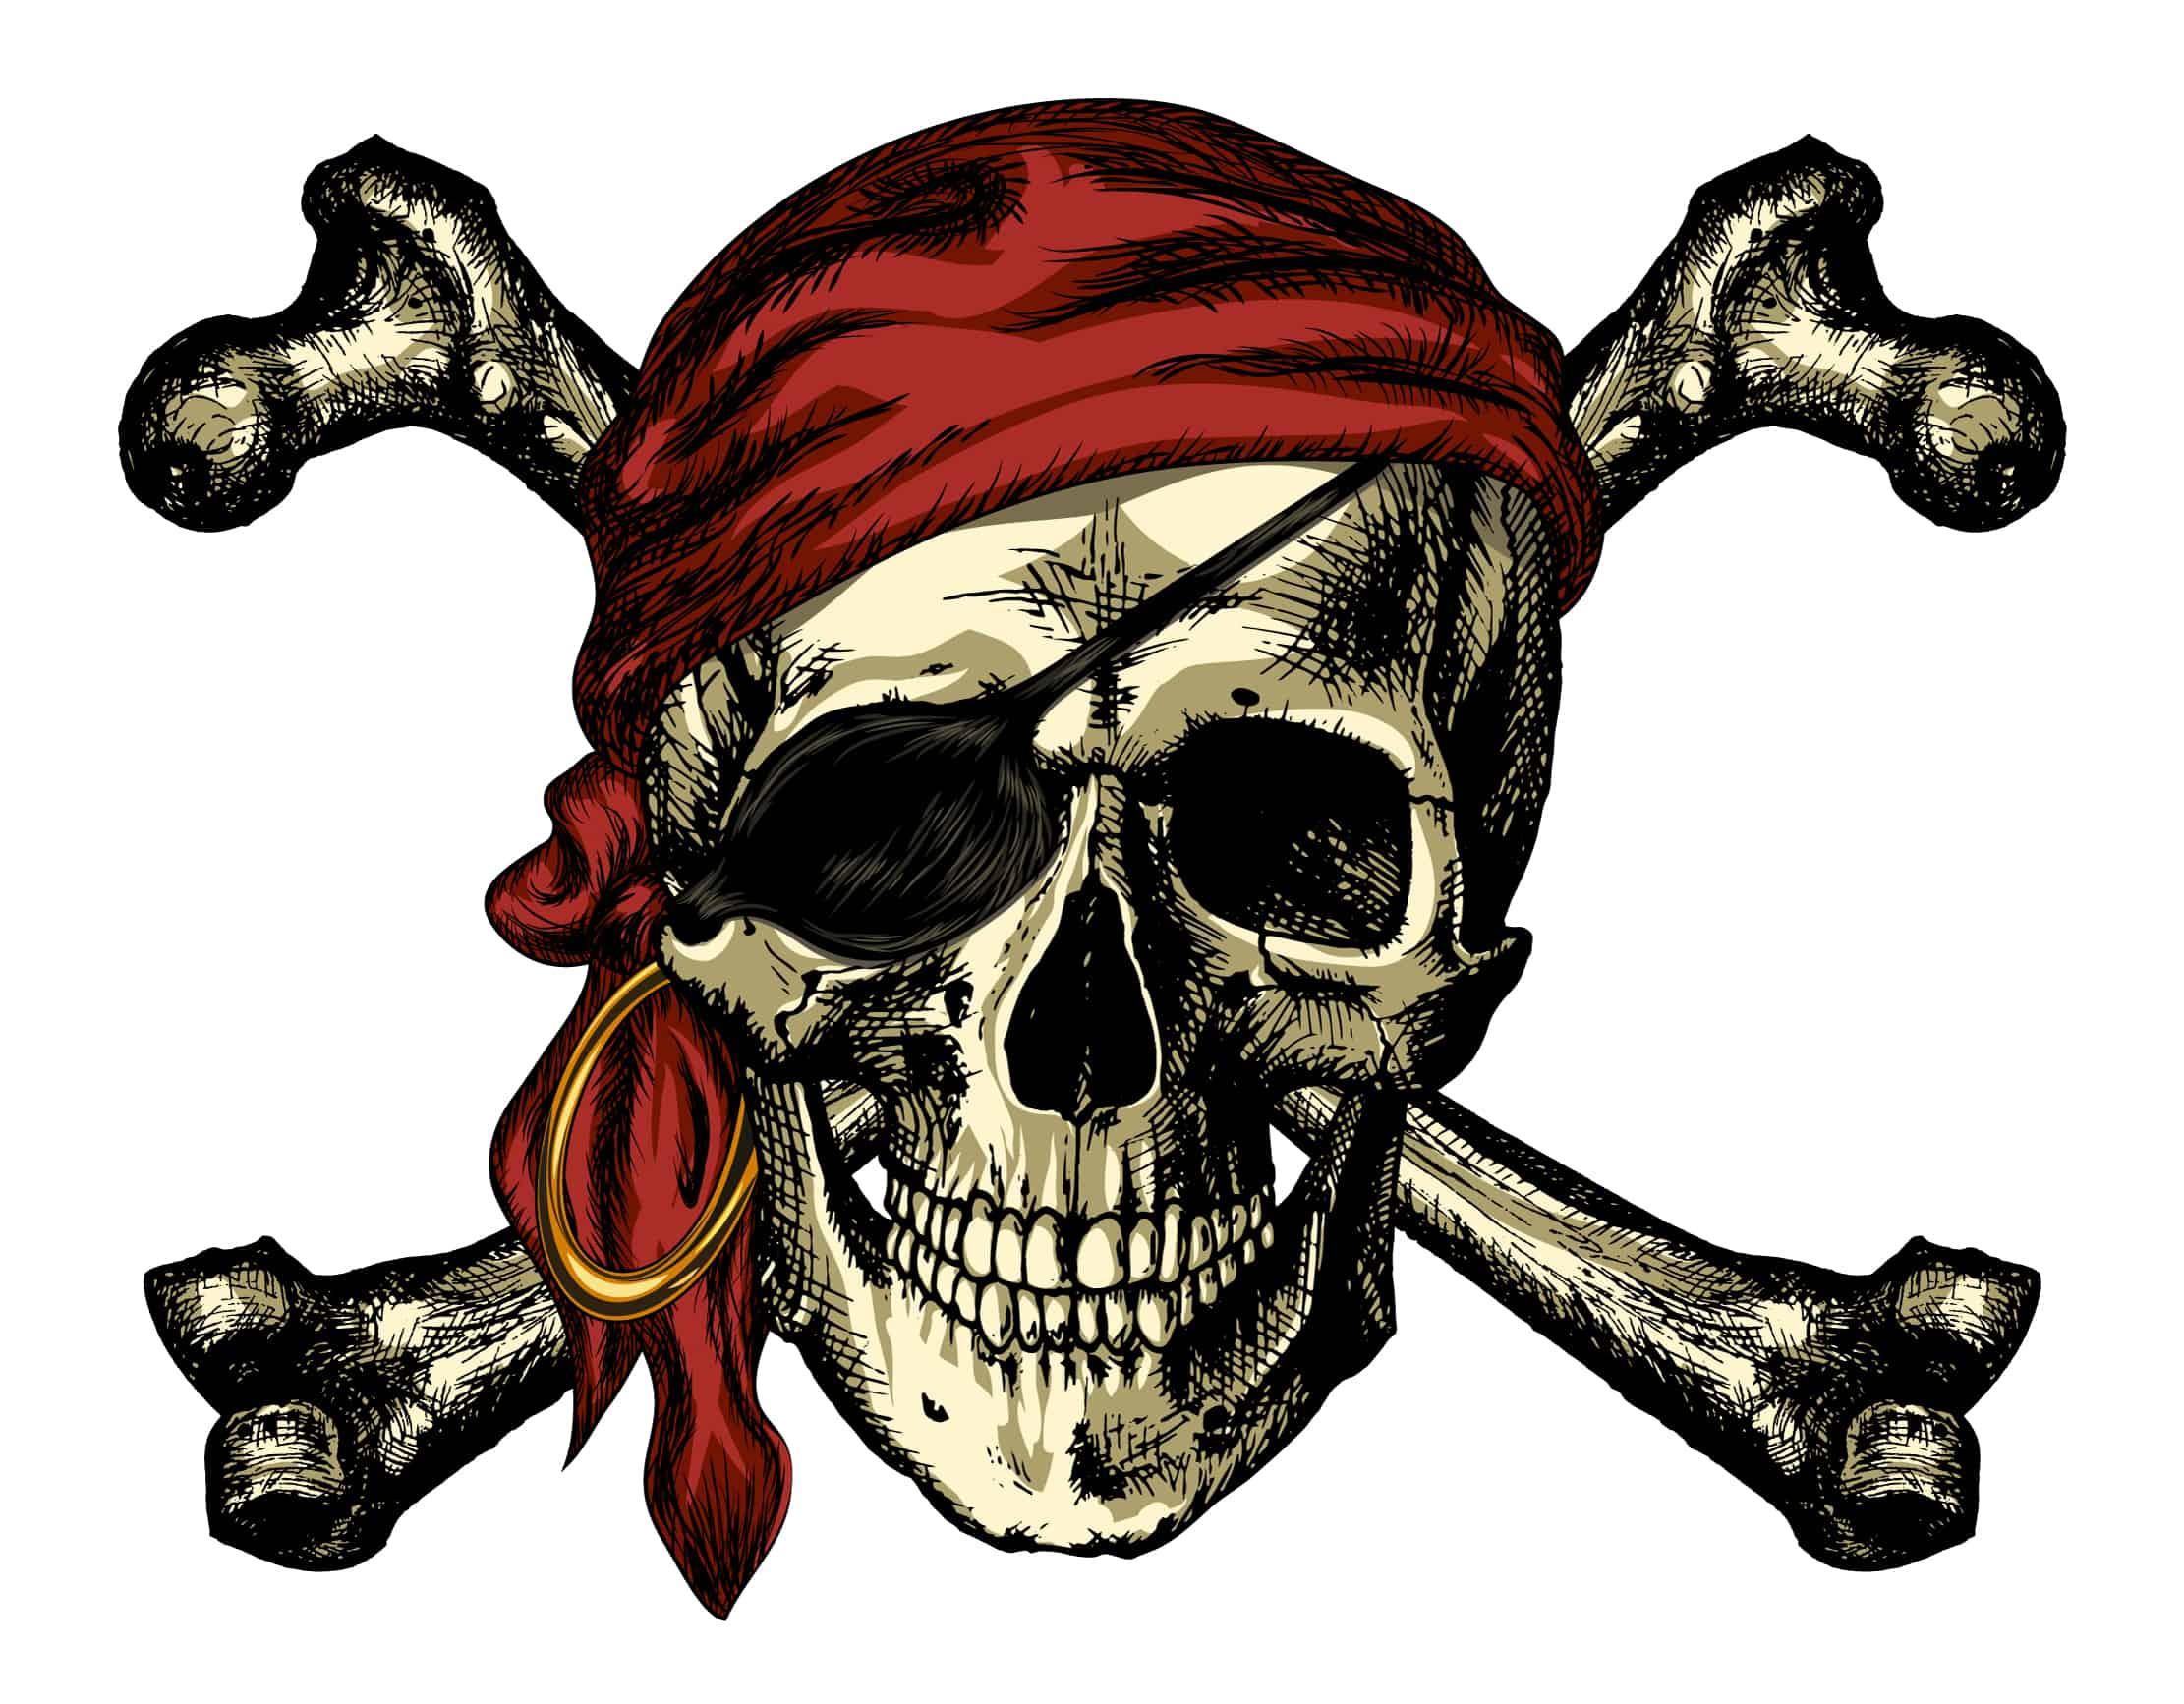 Skull and Crossbones Flag, Symbolism Meaning Origin, a Detailed Illustration of a Pirate Skull